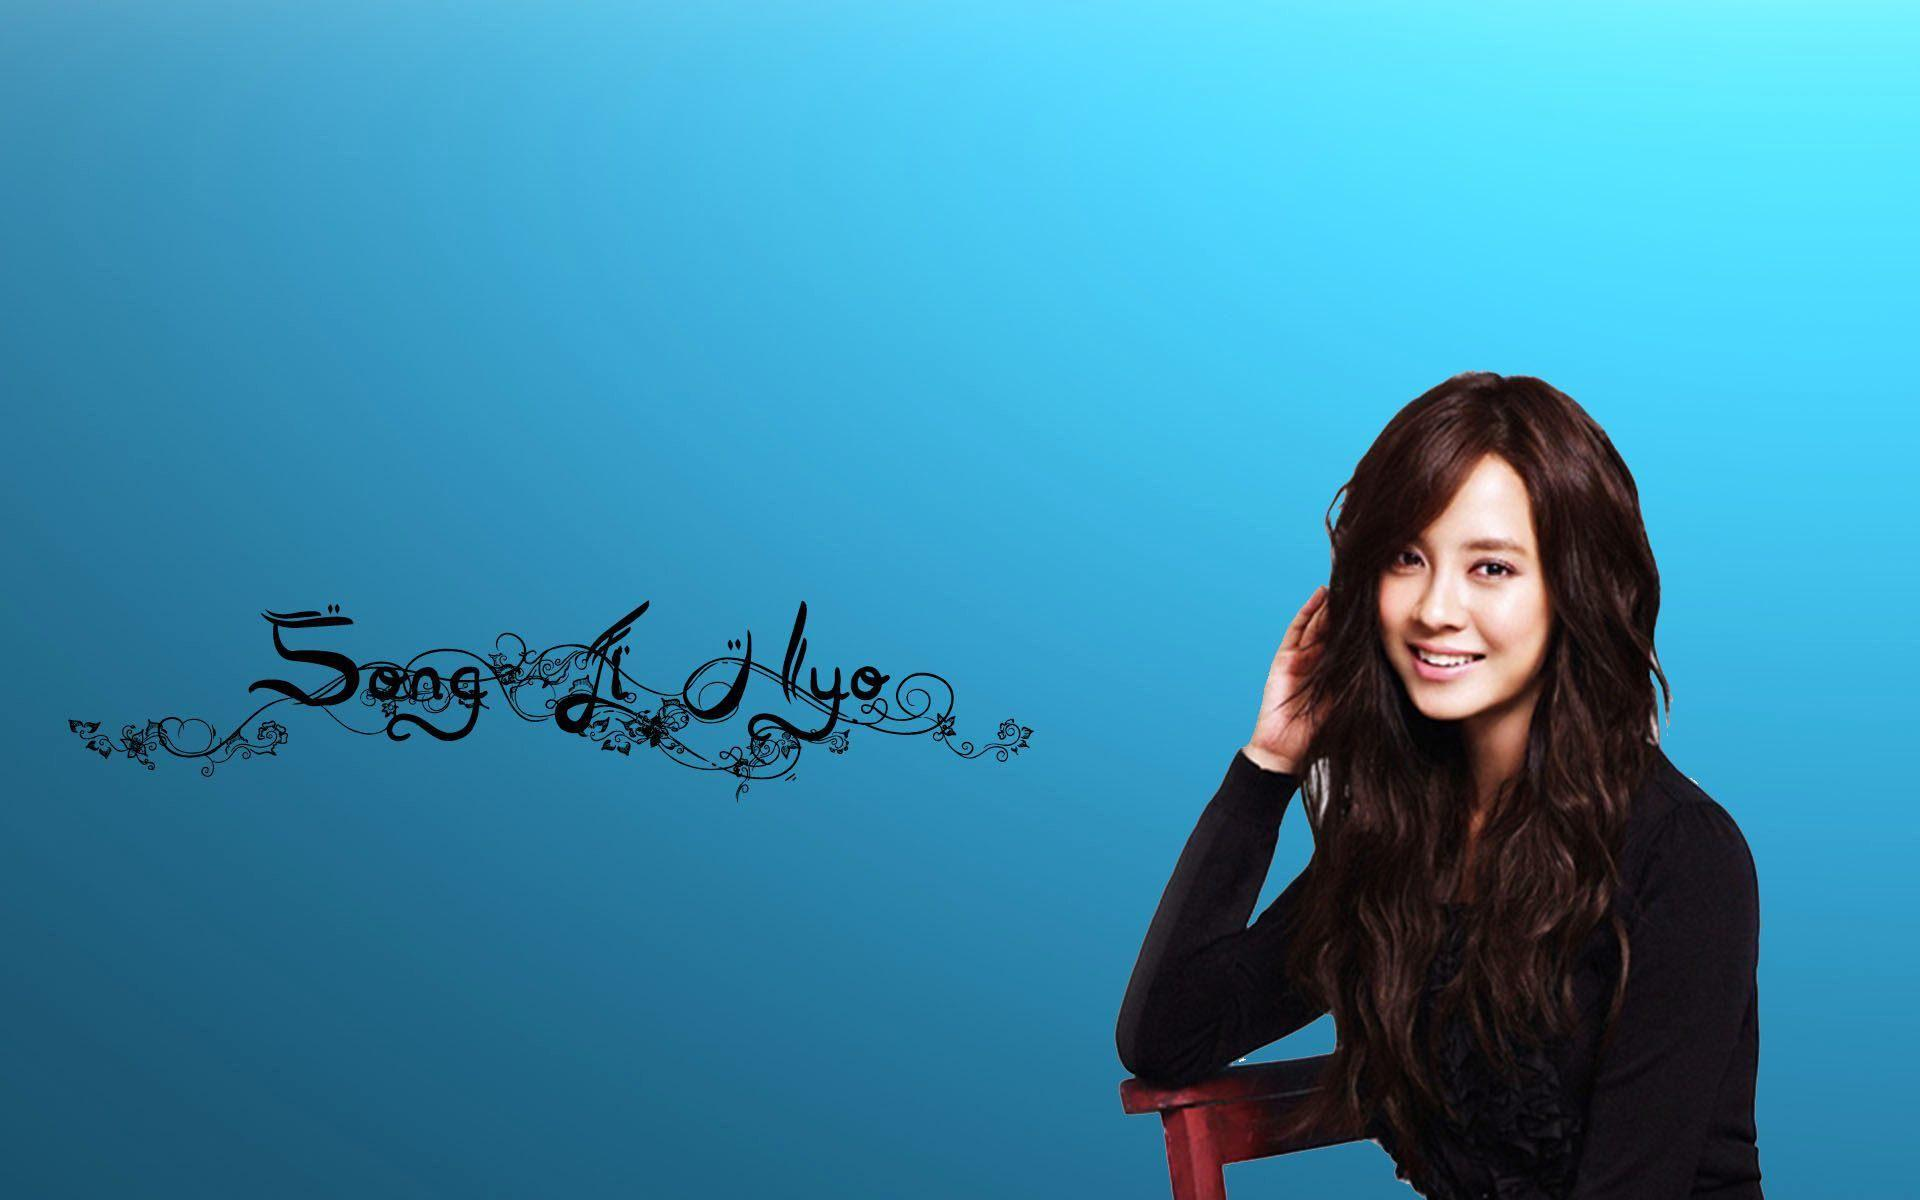 Song Ji hyo Wallpapers Wallpaper Cave